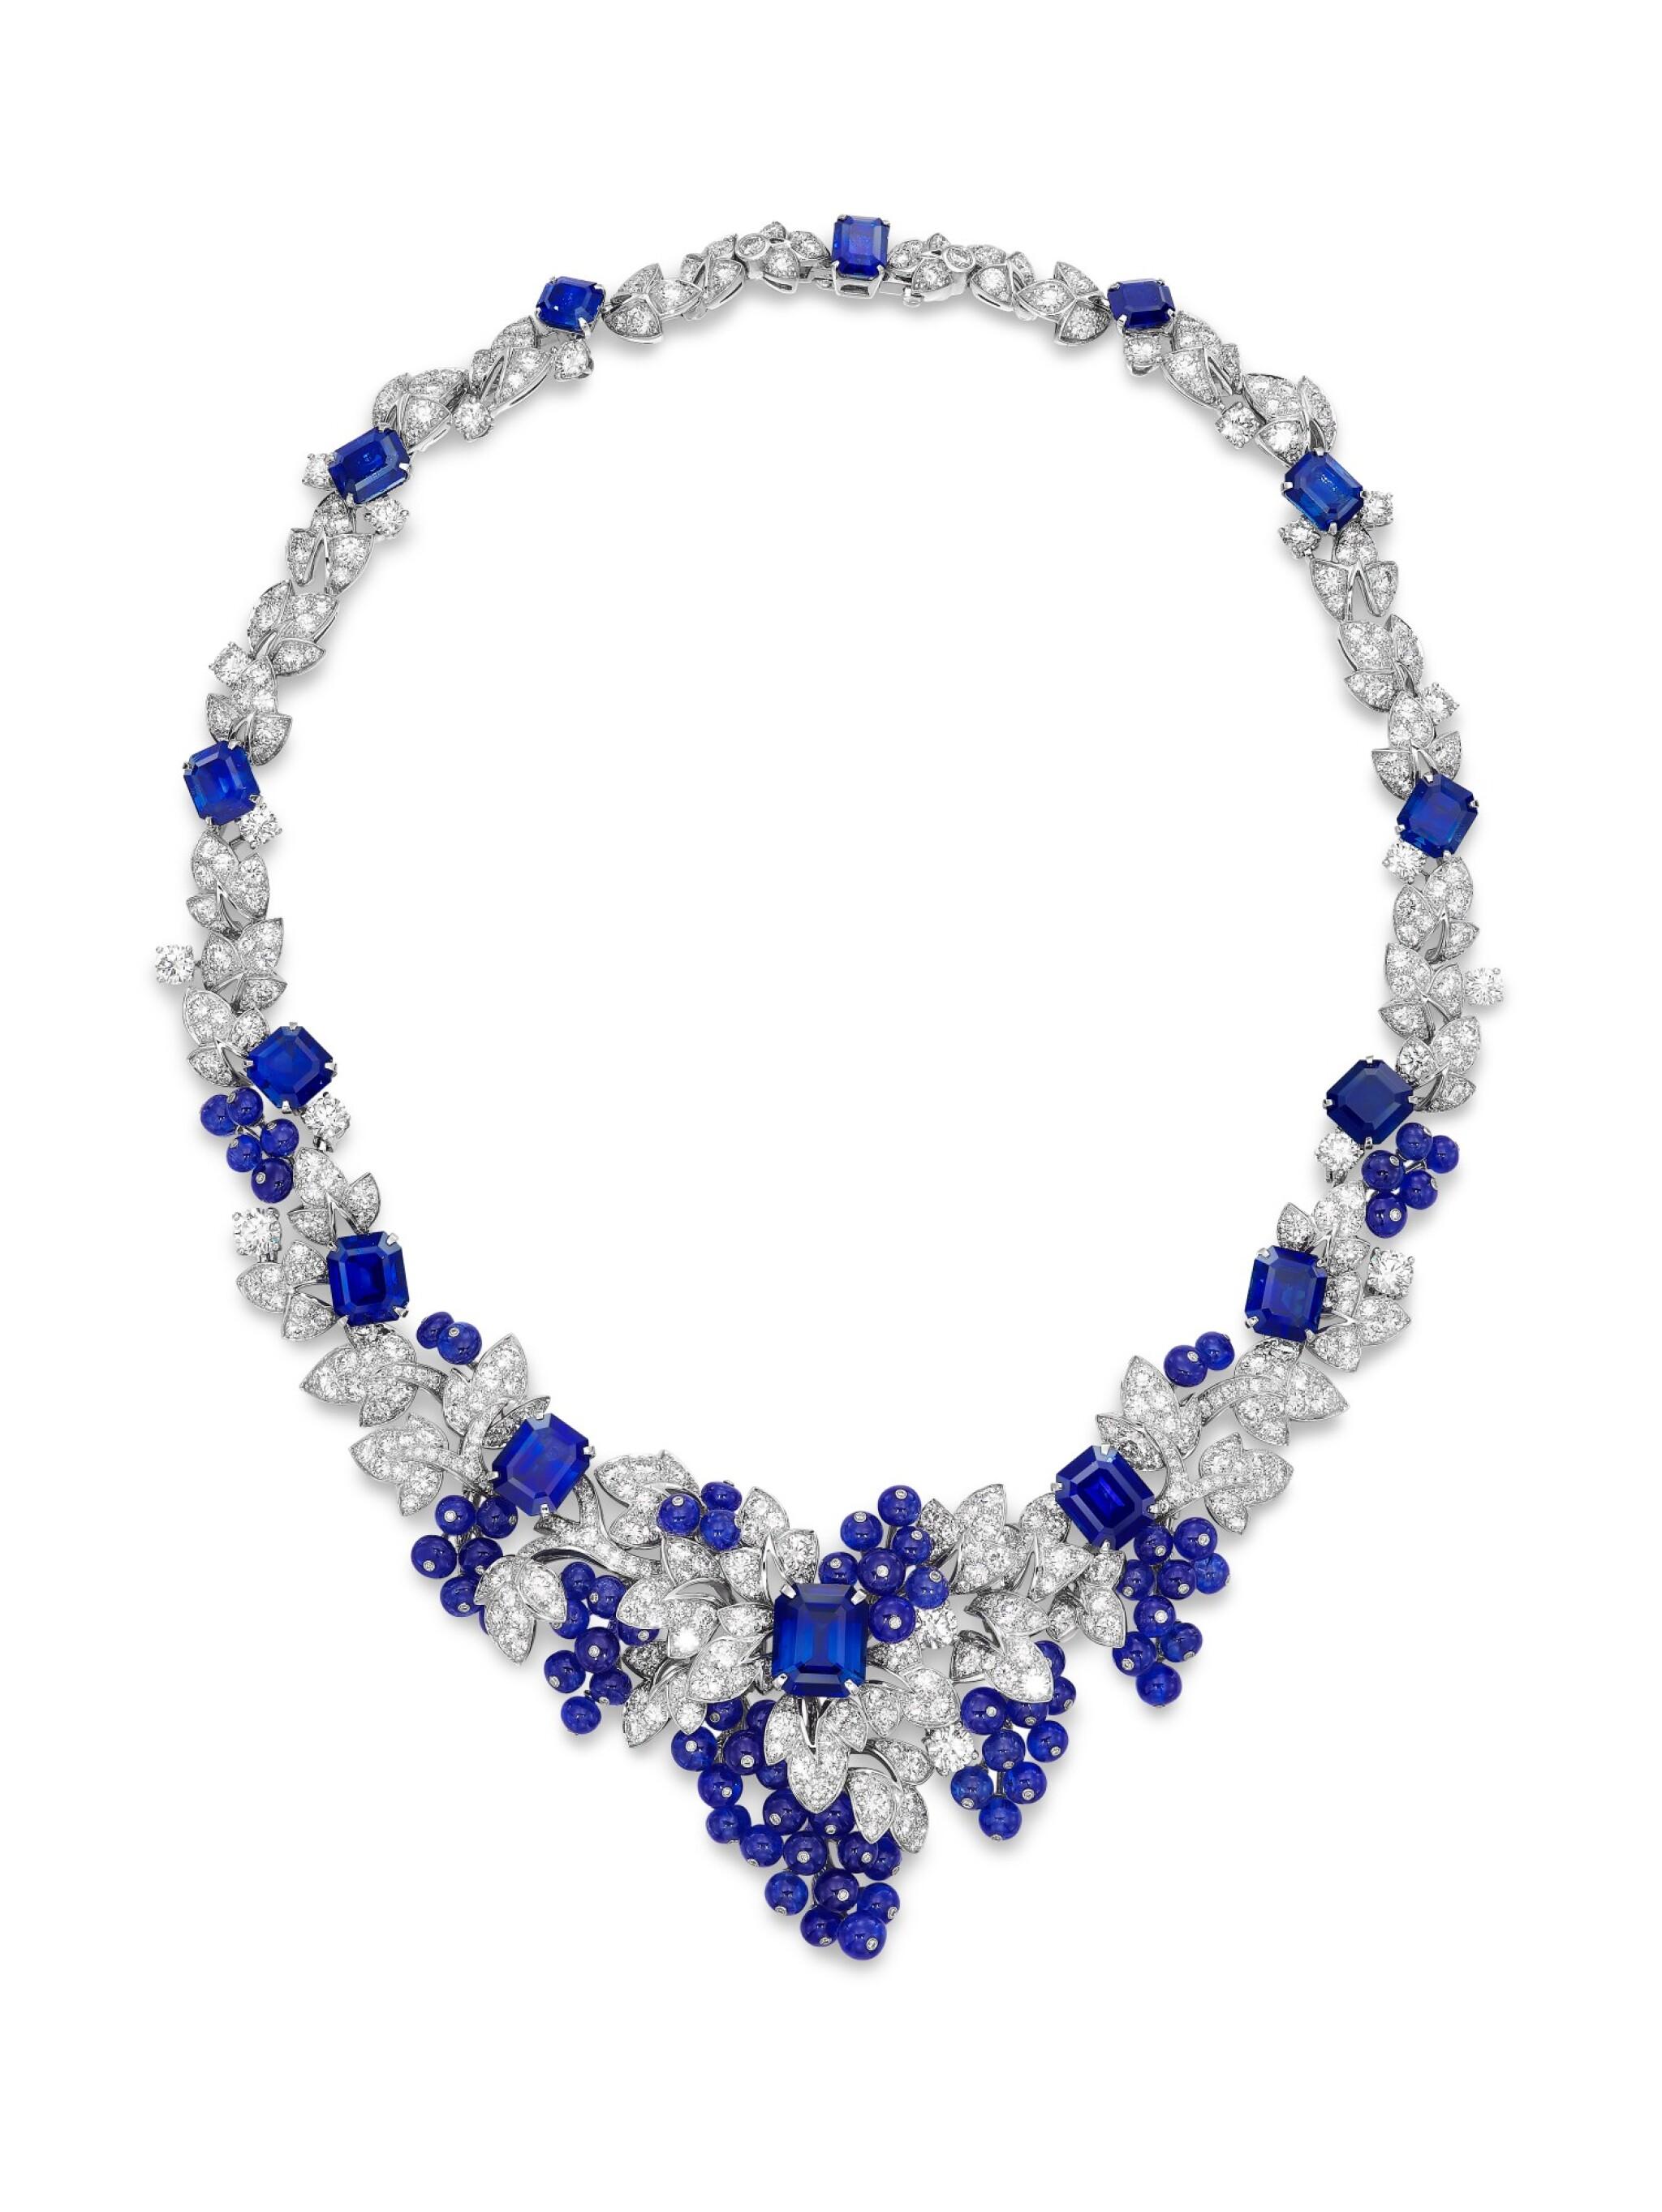 View full screen - View 1 of Lot 1649. GRAFF | SAPPHIRE AND DIAMOND NECKLACE格拉夫 | 藍寶石 配 鑽石 項鏈  (藍寶石及鑽石共重約142.06及33.96卡拉 ).